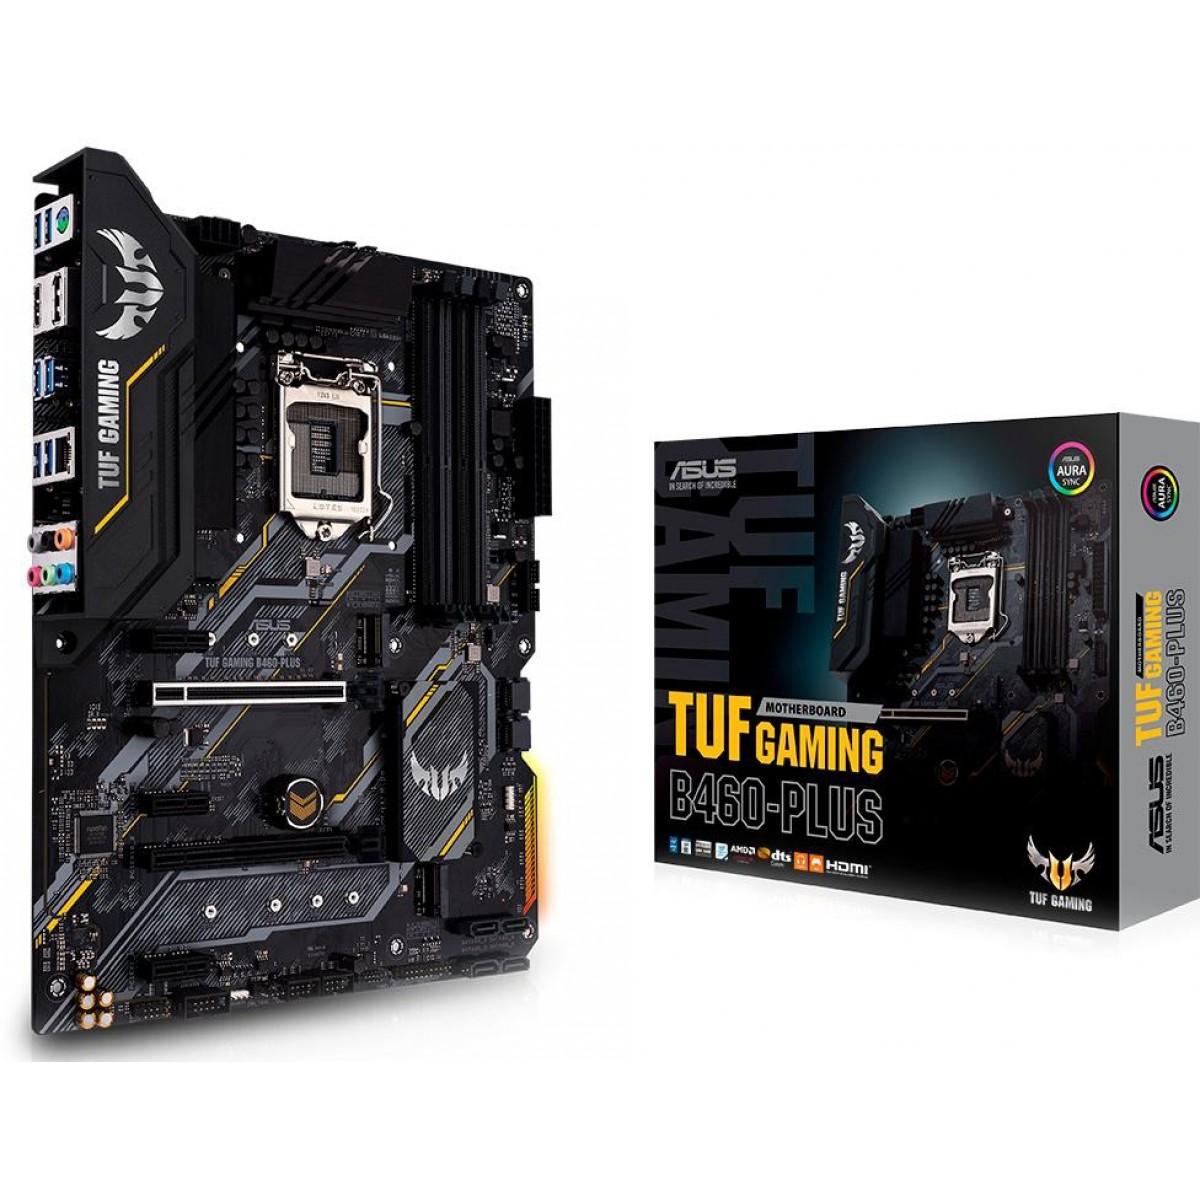 Placa Mãe Asus Tuf Gaming B460-Plus, Chipset B460, Intel LGA 1200, ATX, DDR4